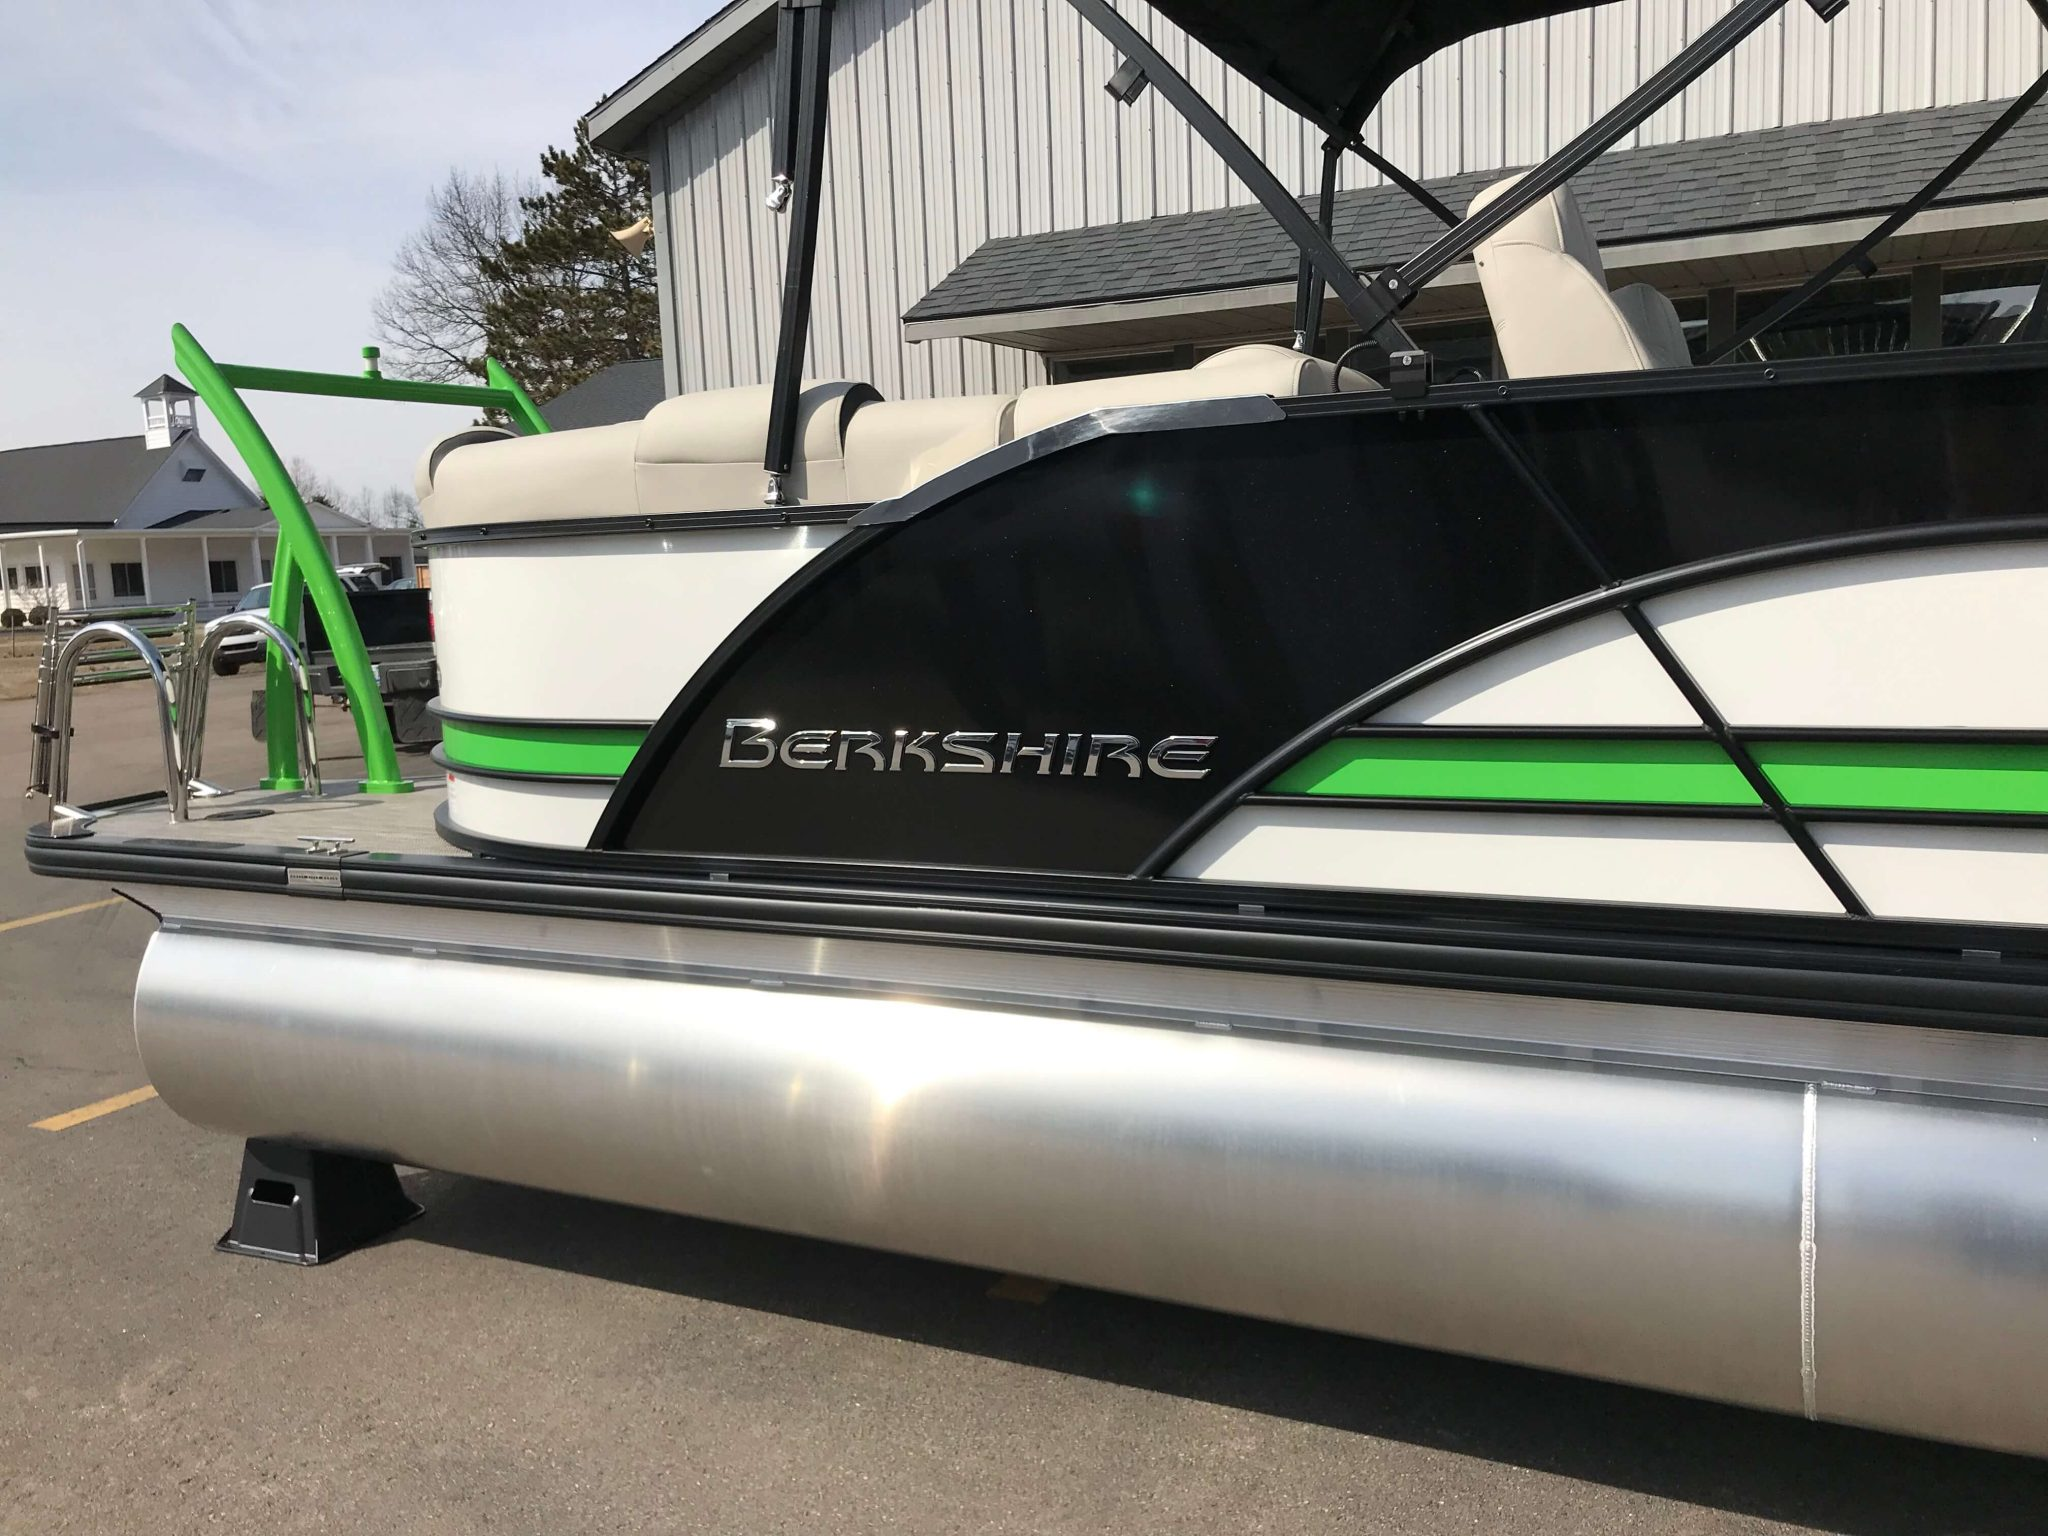 2019 Berkshire 23RFX STS Black Green White 5